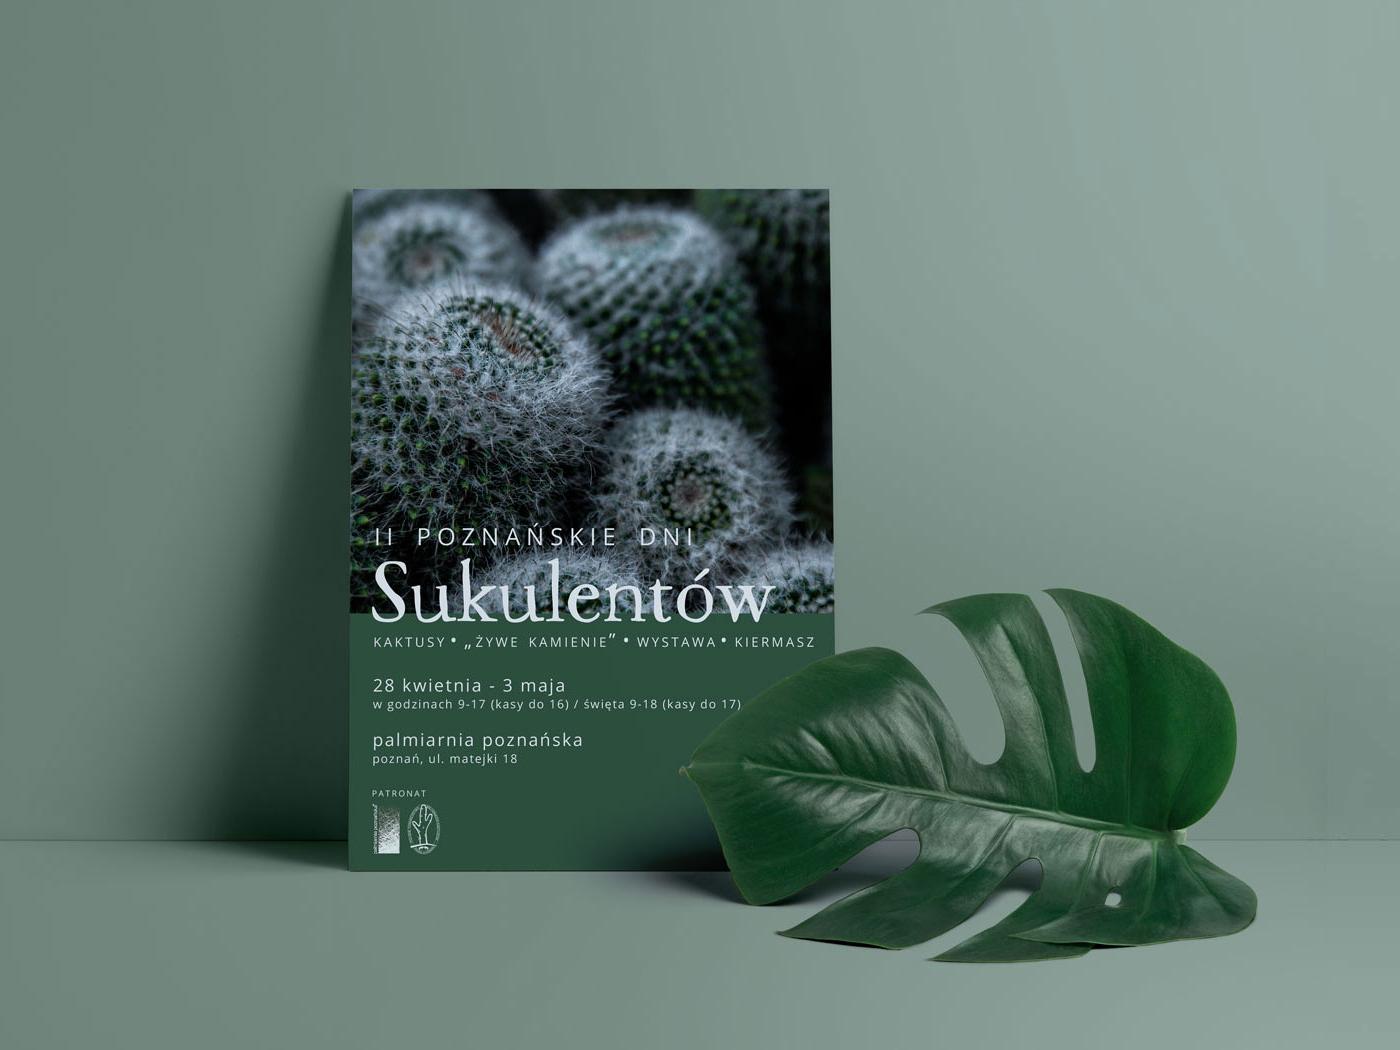 Poznańskie Dni Sukulentów cactus green succulents poster design poster plants flyer design flyer